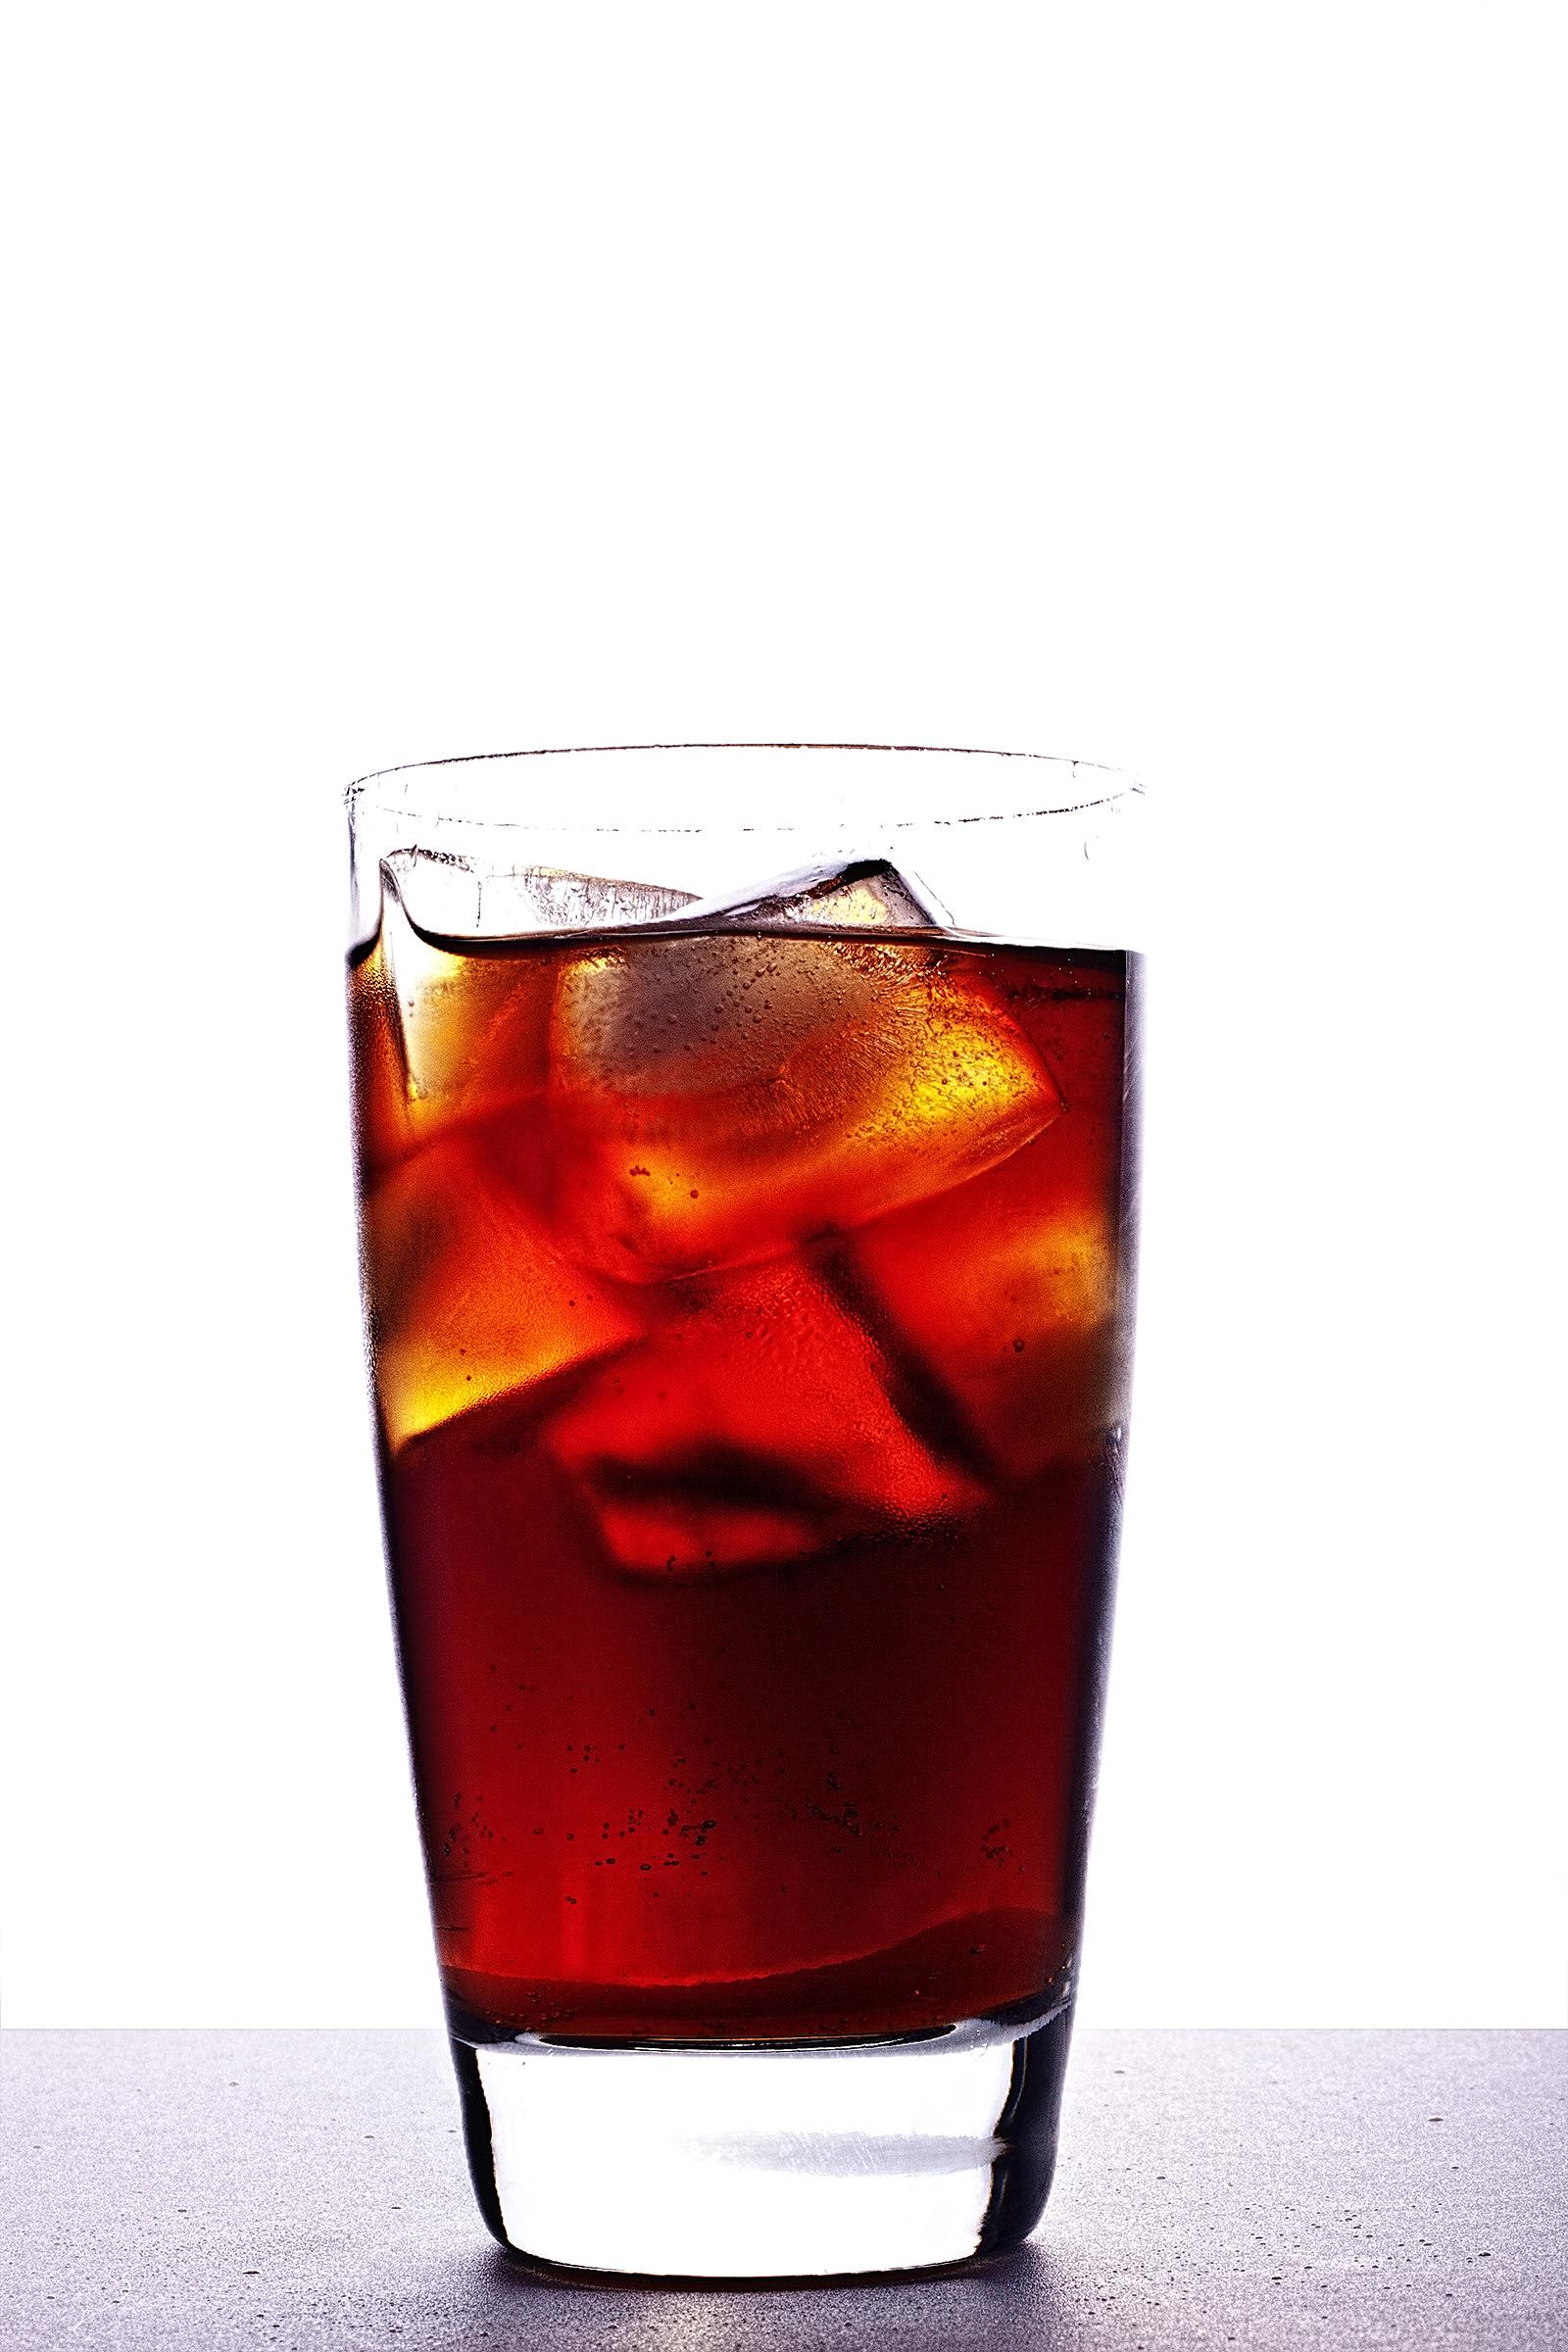 Soda Pop, Glass, Summer, Softdrink, Refreshment, HQ Photo